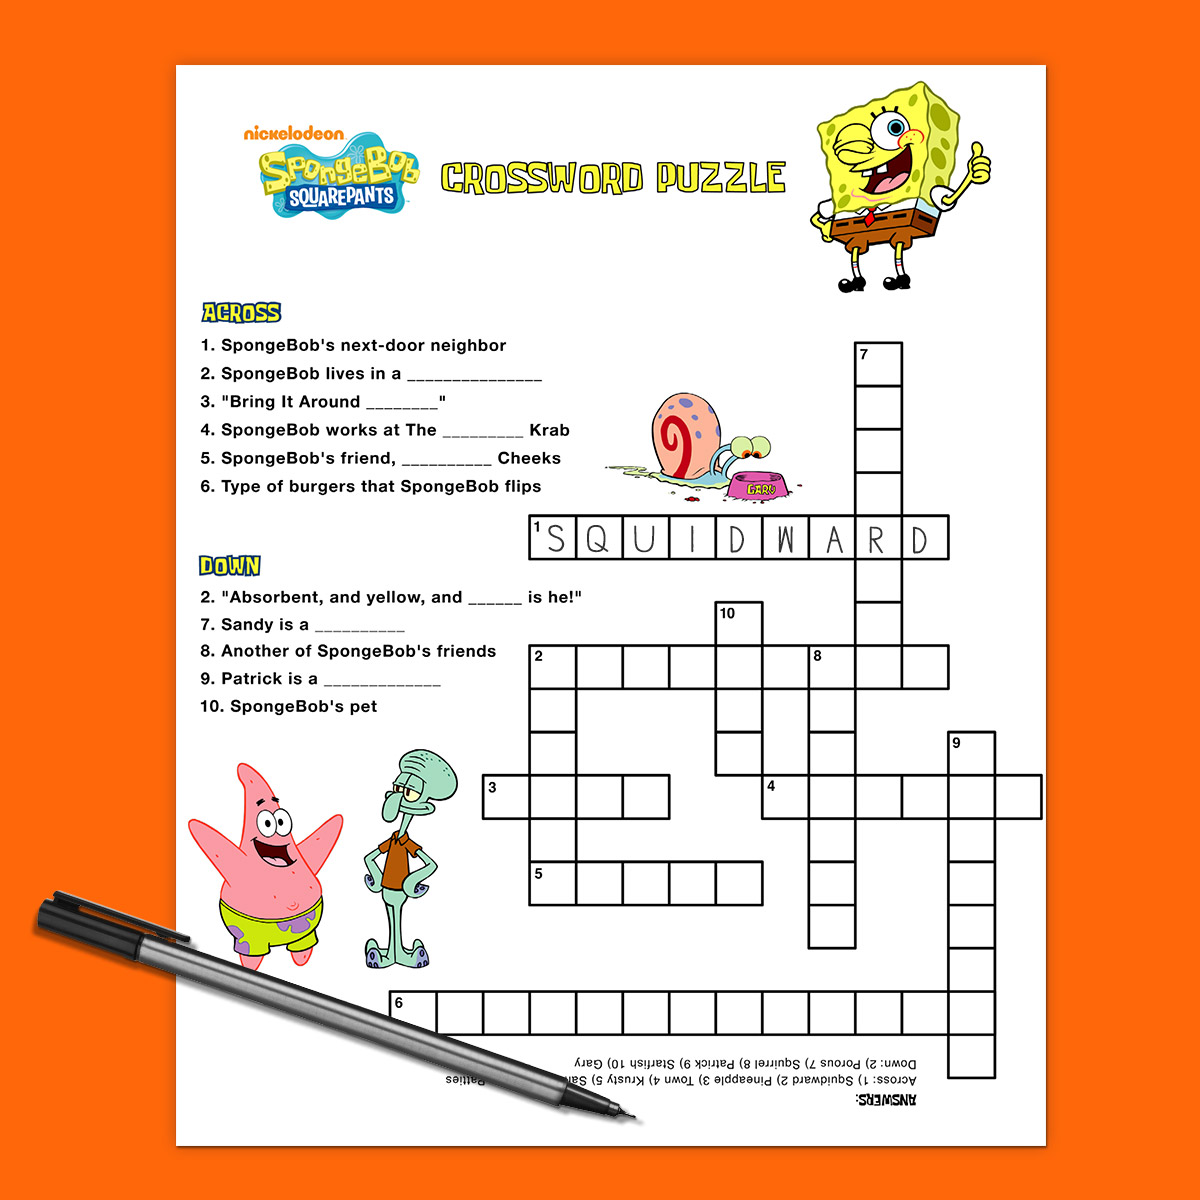 SpongeBob Crossword Puzzle